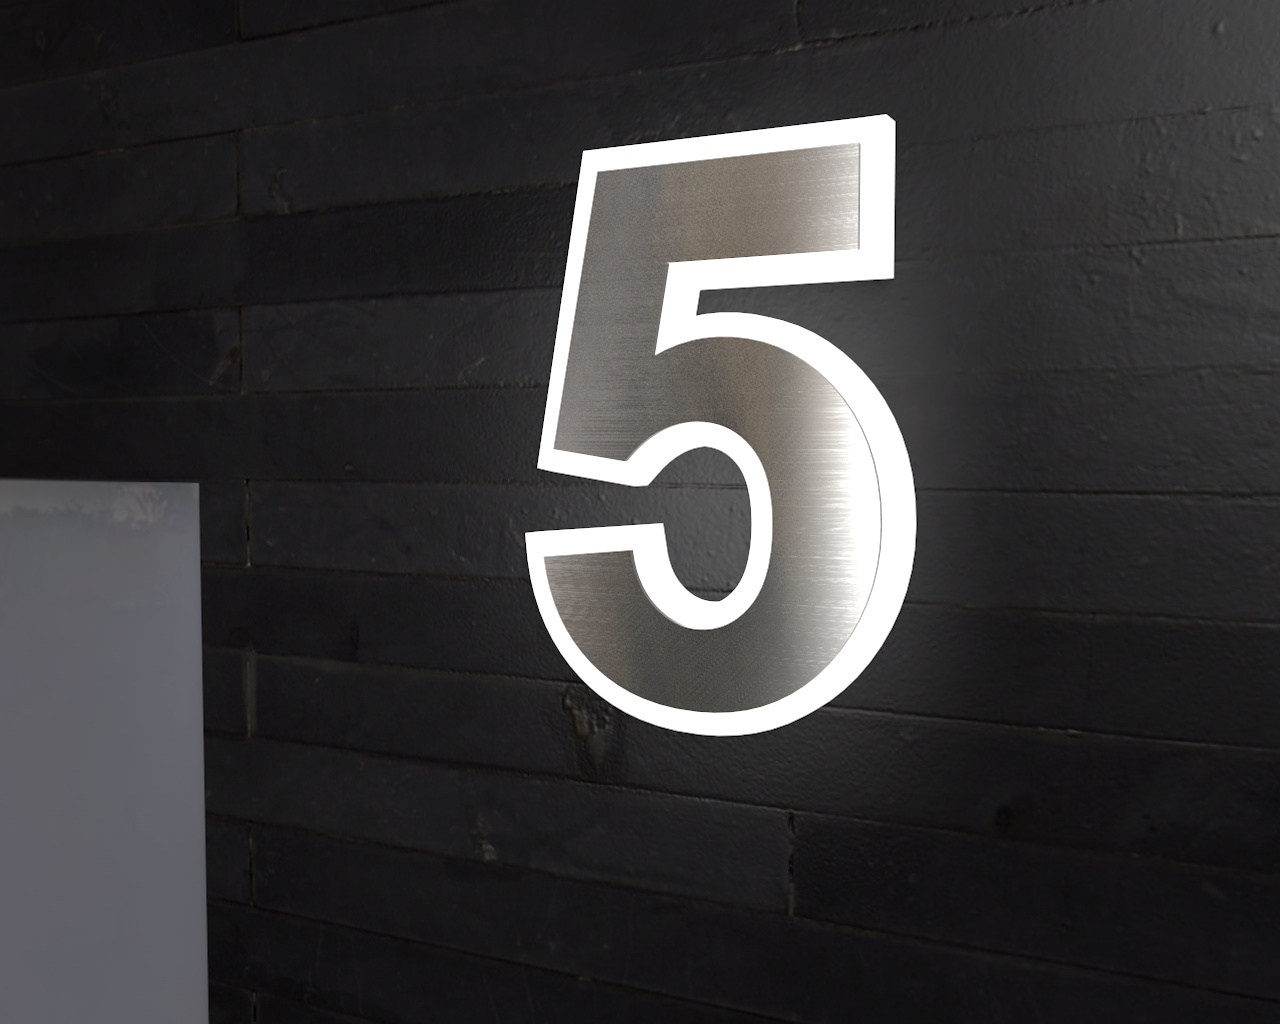 edelstahl hausnummer beleuchtete hausnummer 8 ambilight. Black Bedroom Furniture Sets. Home Design Ideas